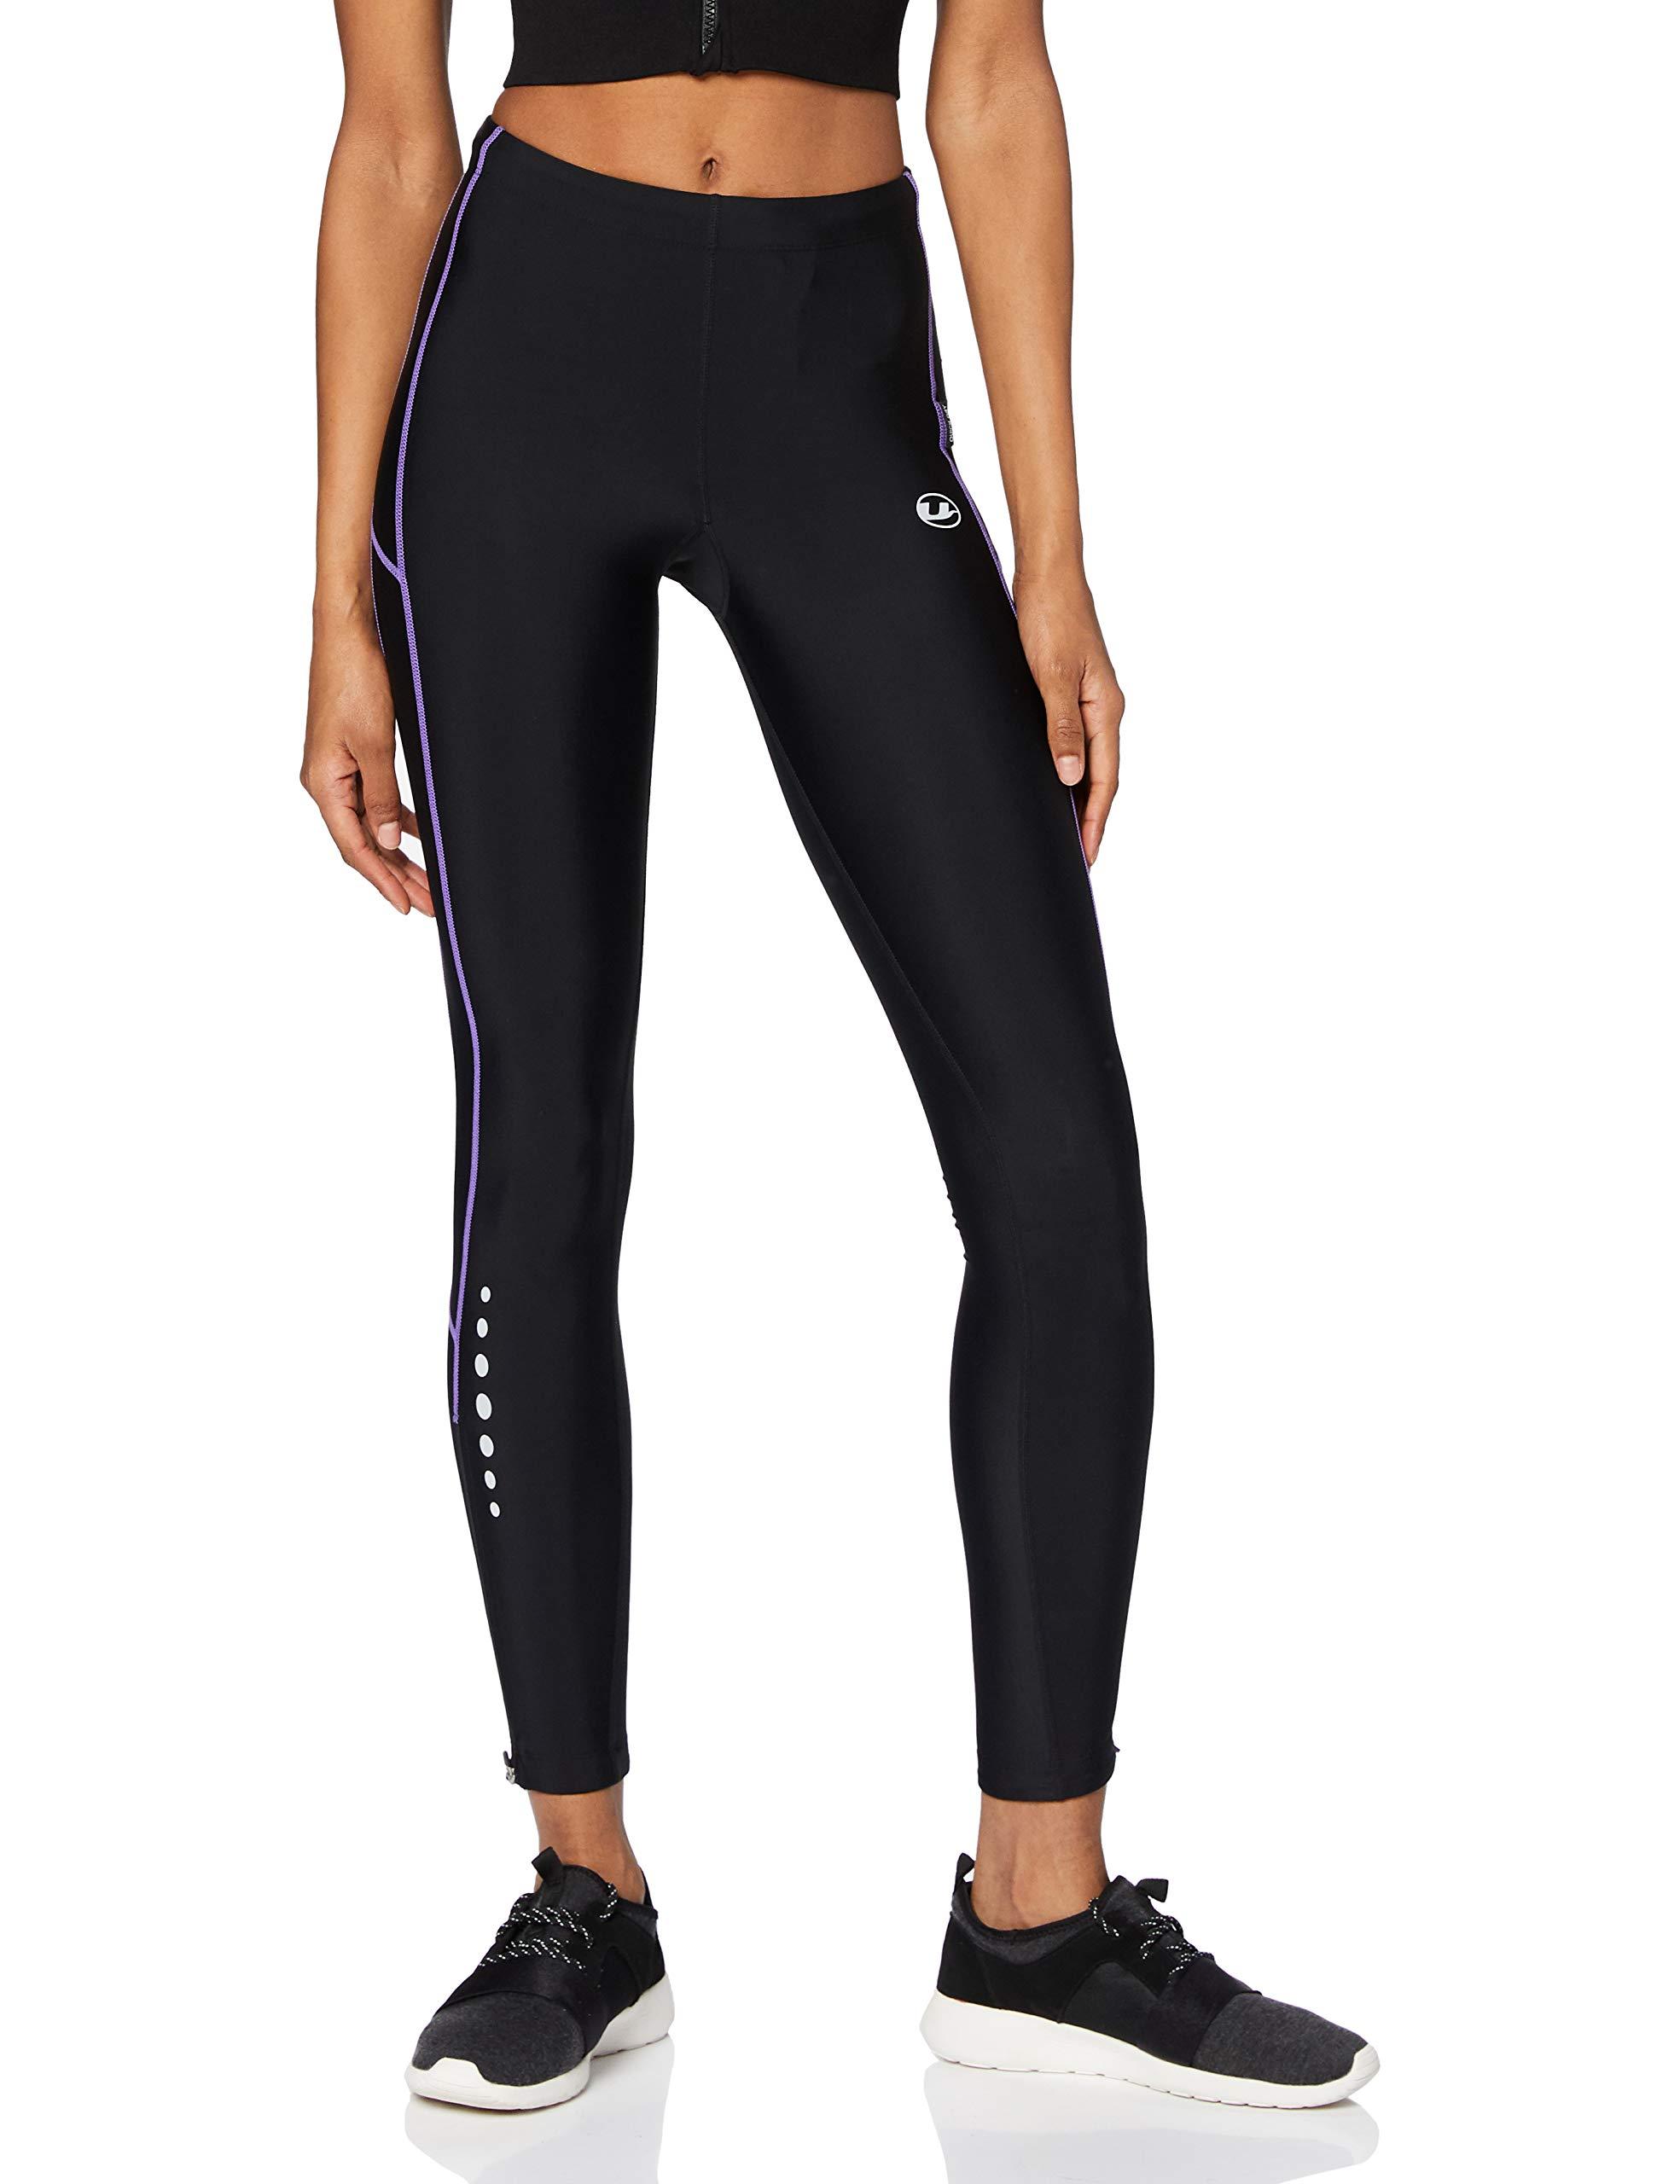 Ultrasport Damen Laufhose lang, black purple, XL, 10135